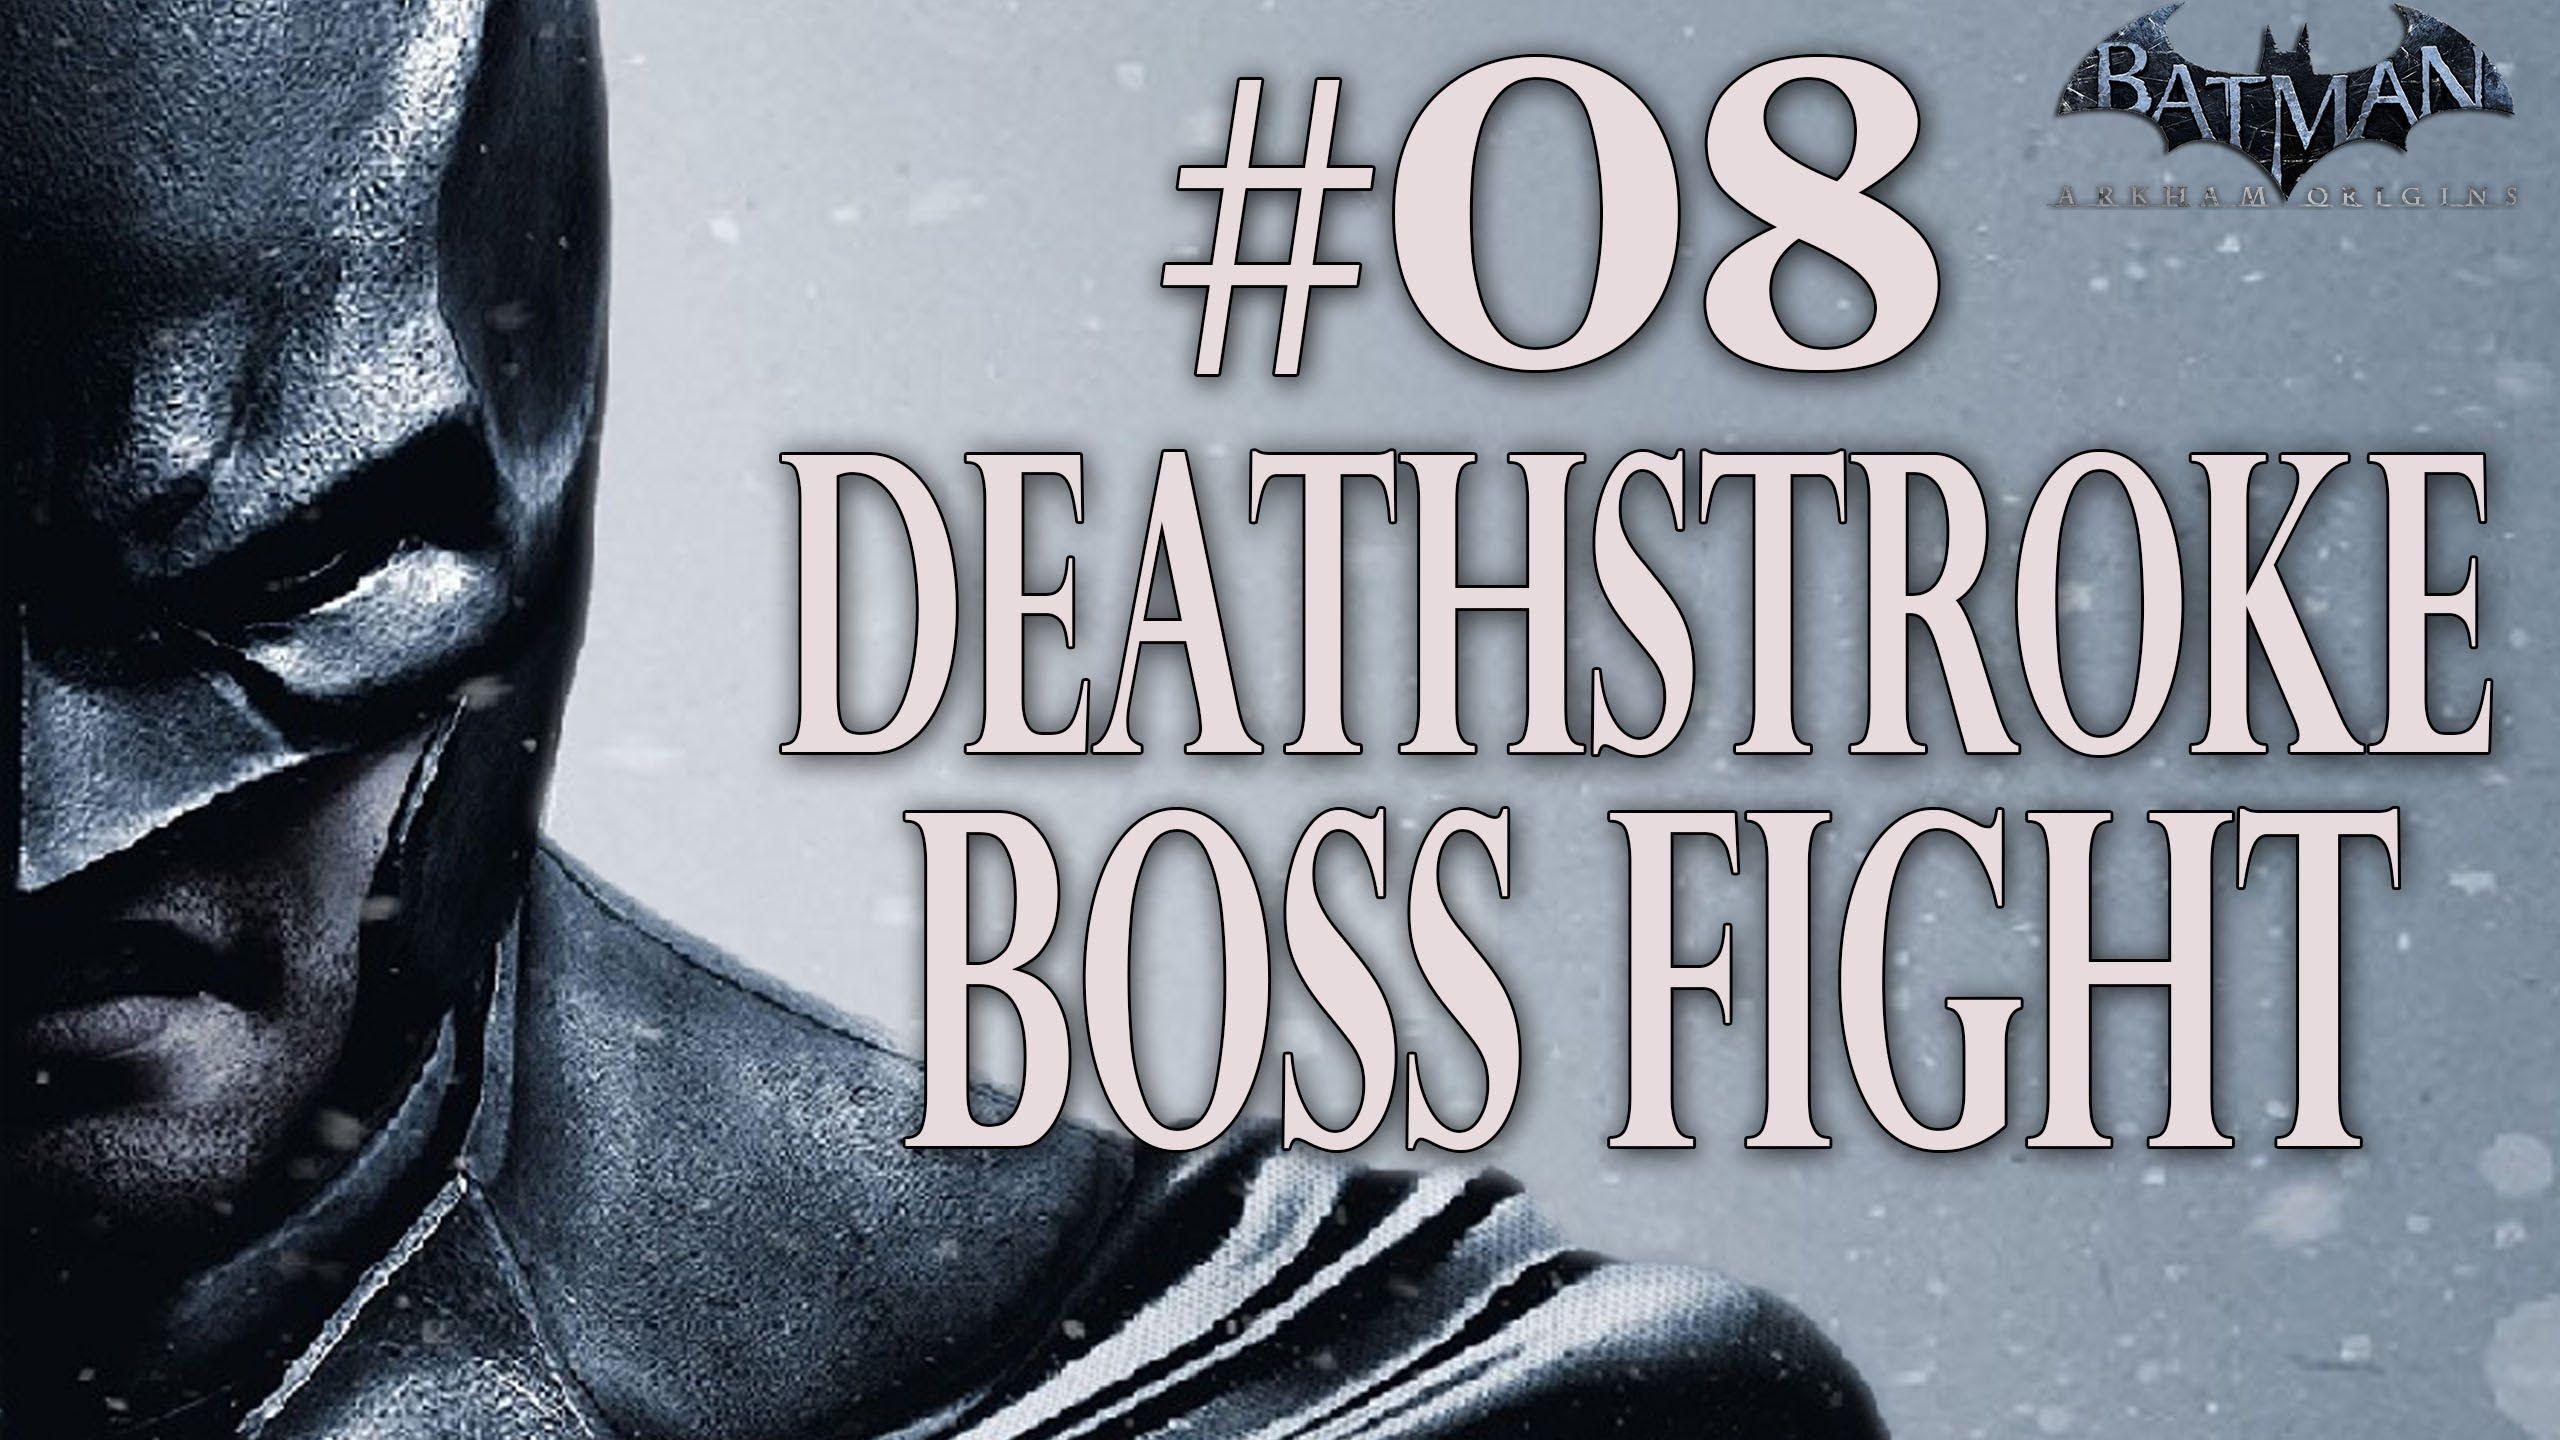 Batman: Arkham Origins - Walkthrough (08) - Deathstroke Boss Fight